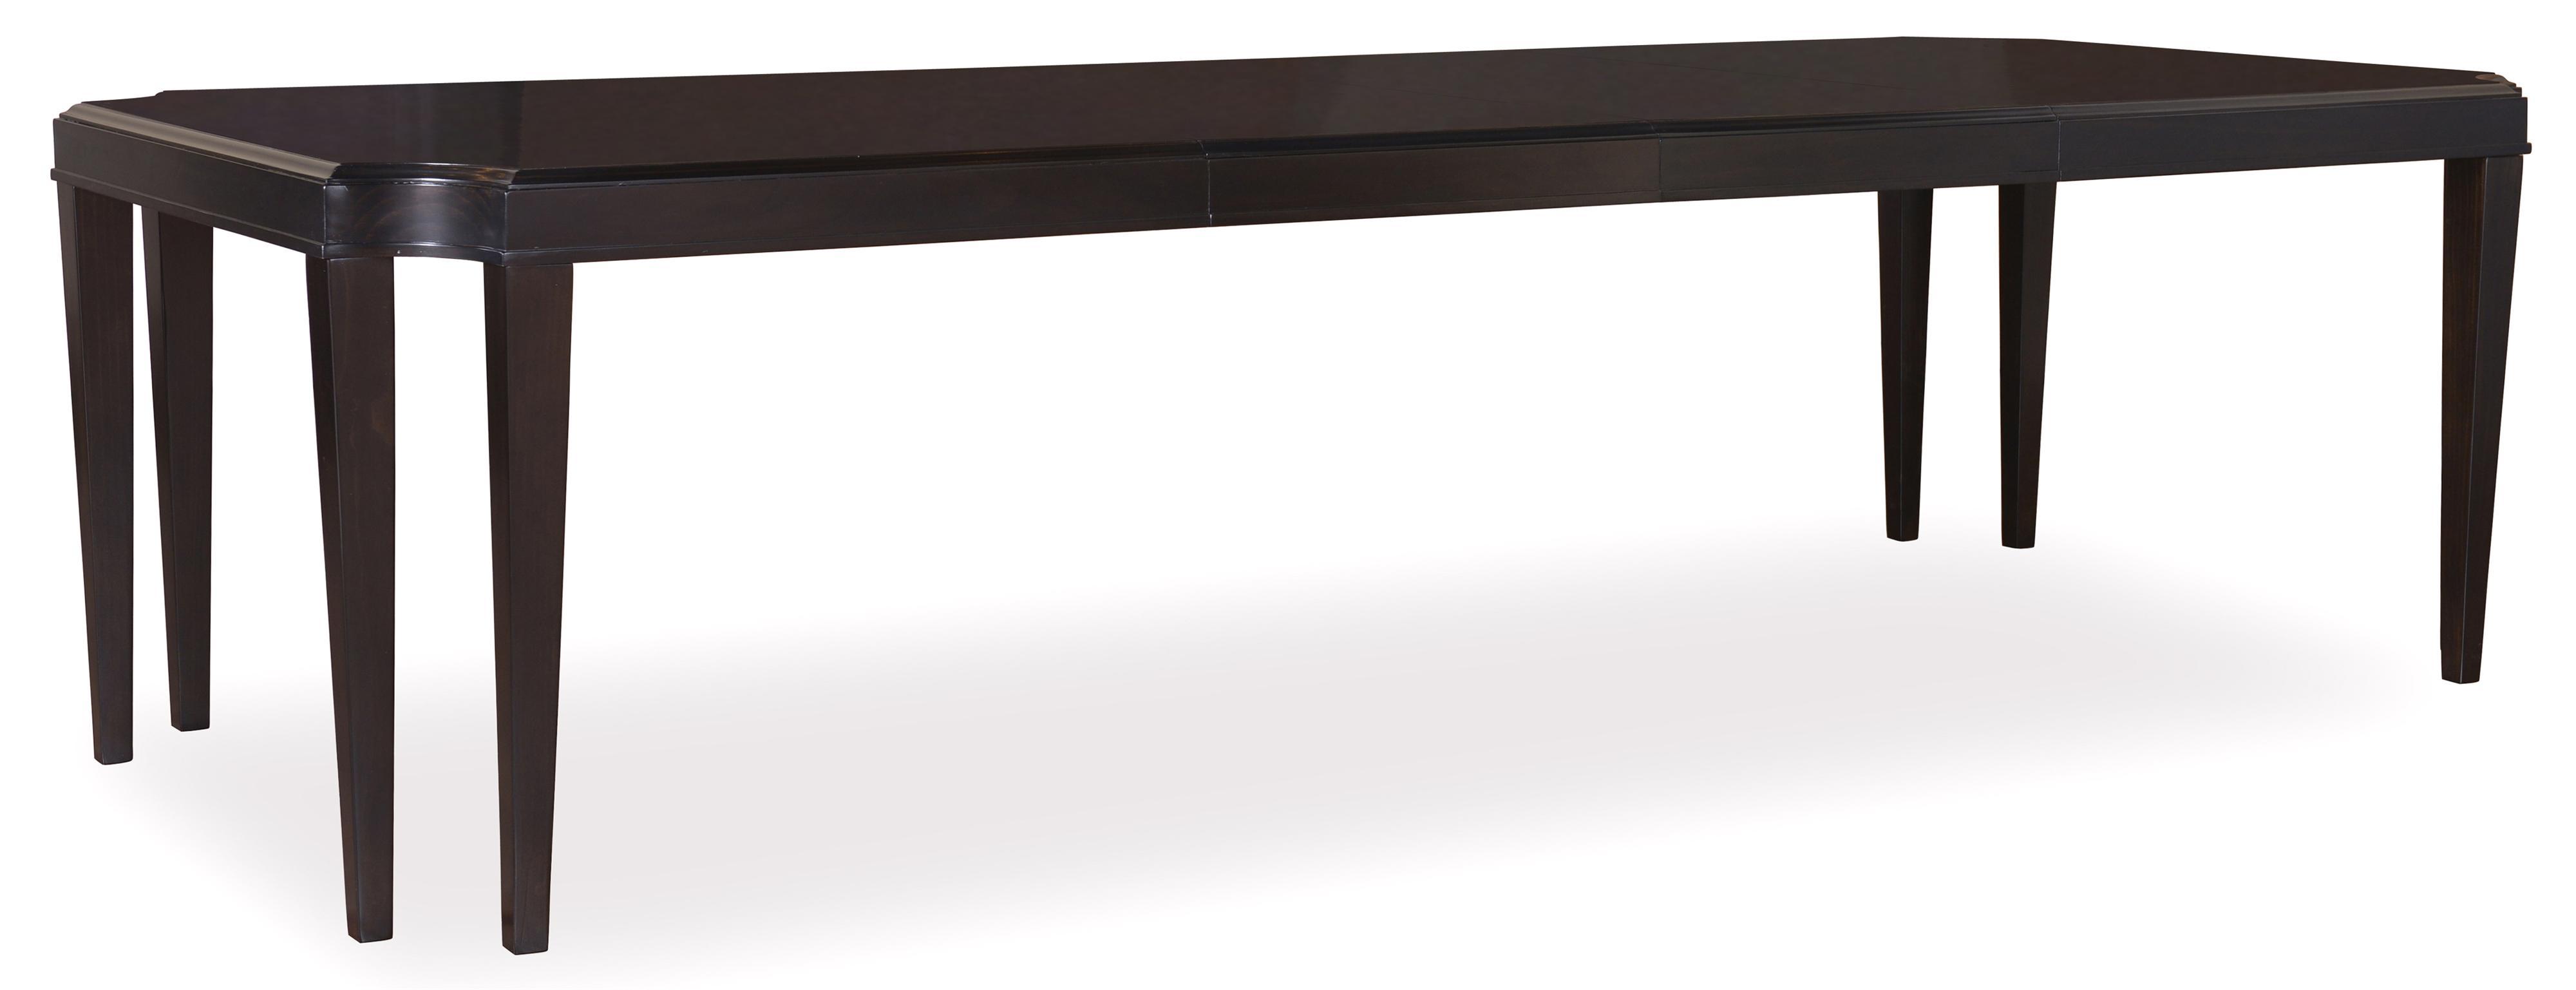 Belfort Signature Magellan Leg Dining Table - Item Number: 208220-1815